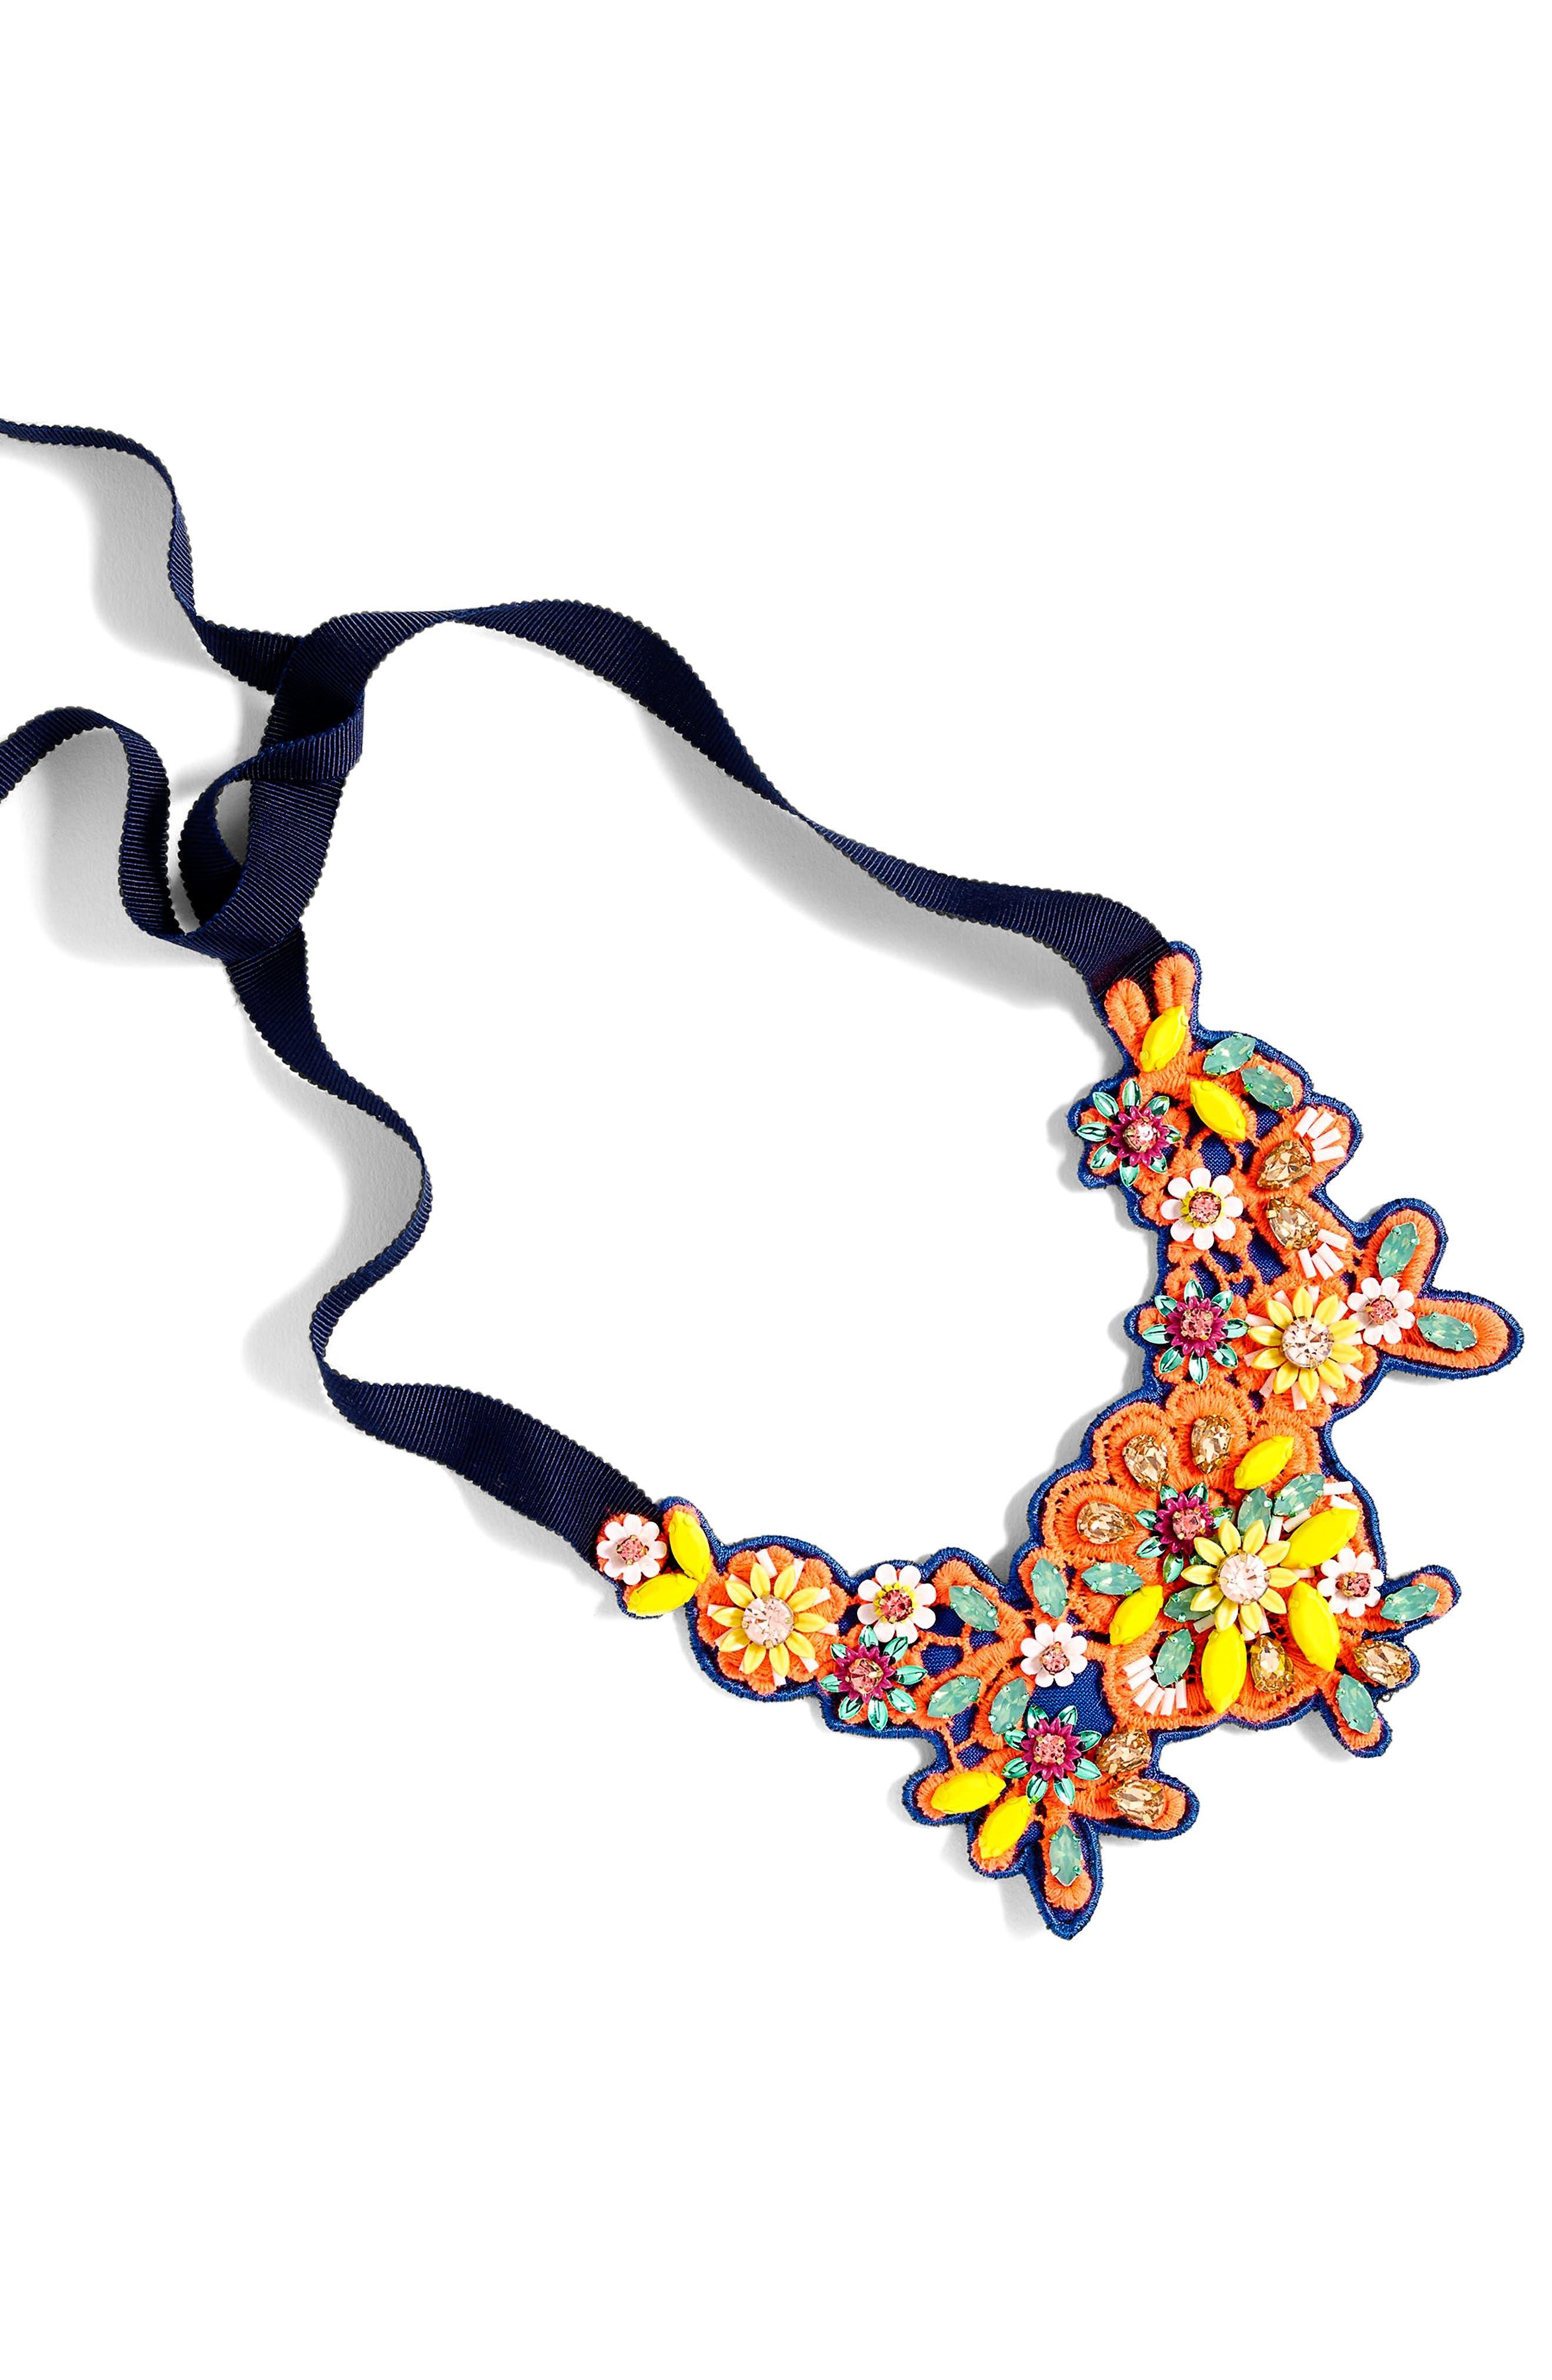 Main Image - J.Crew Embellished Crystal Bib Necklace